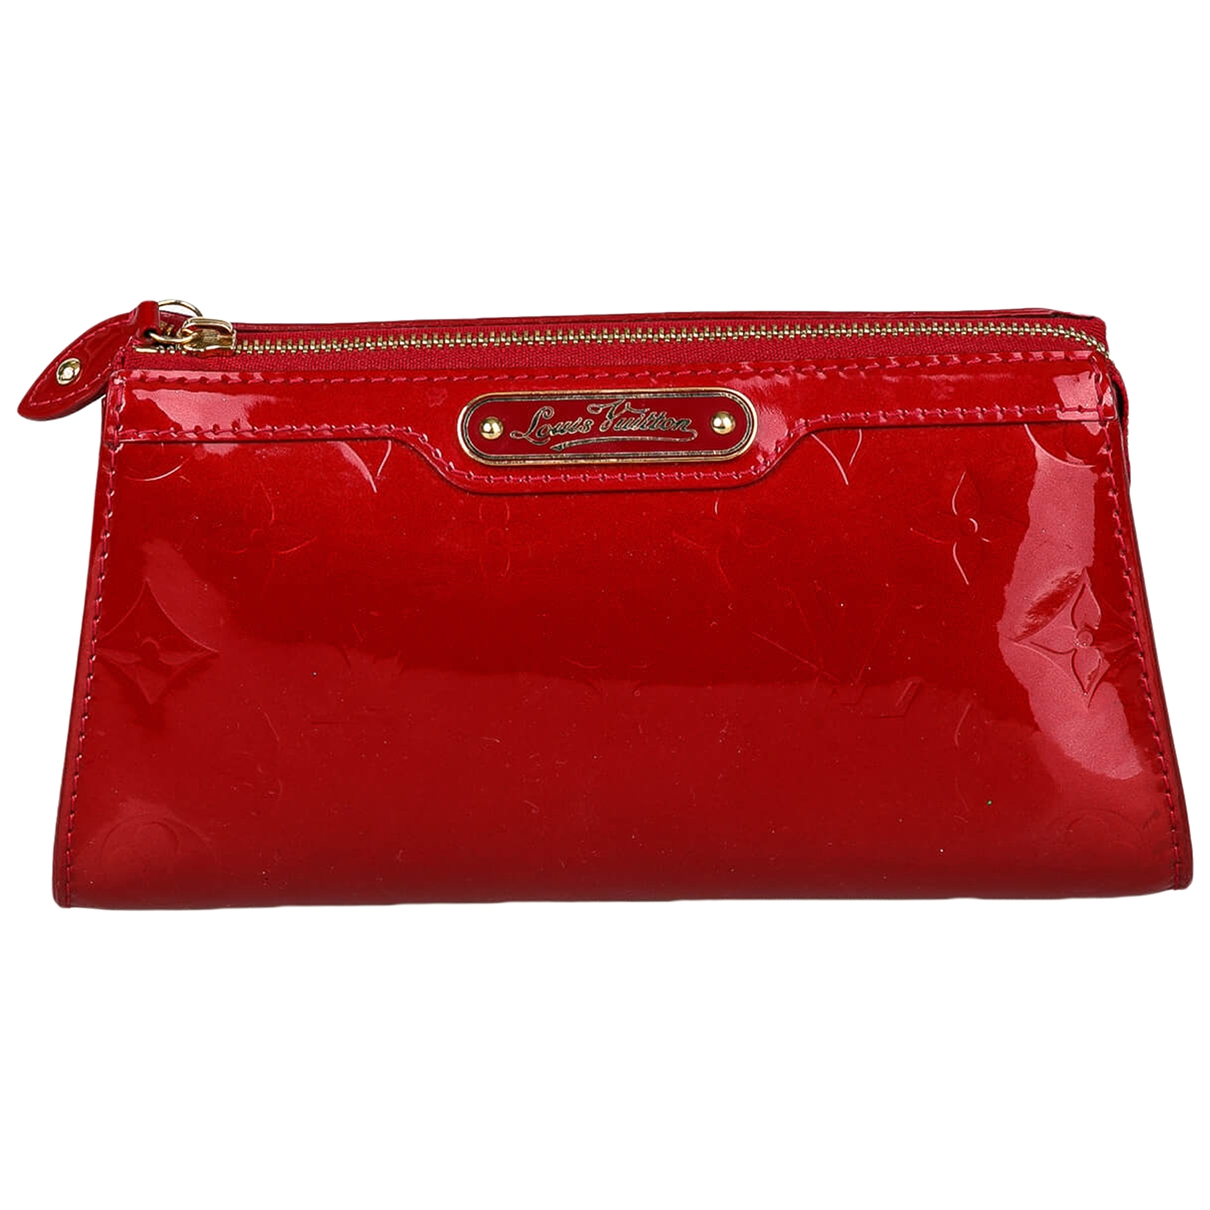 Louis Vuitton \N Clutch in  Rot Lackleder